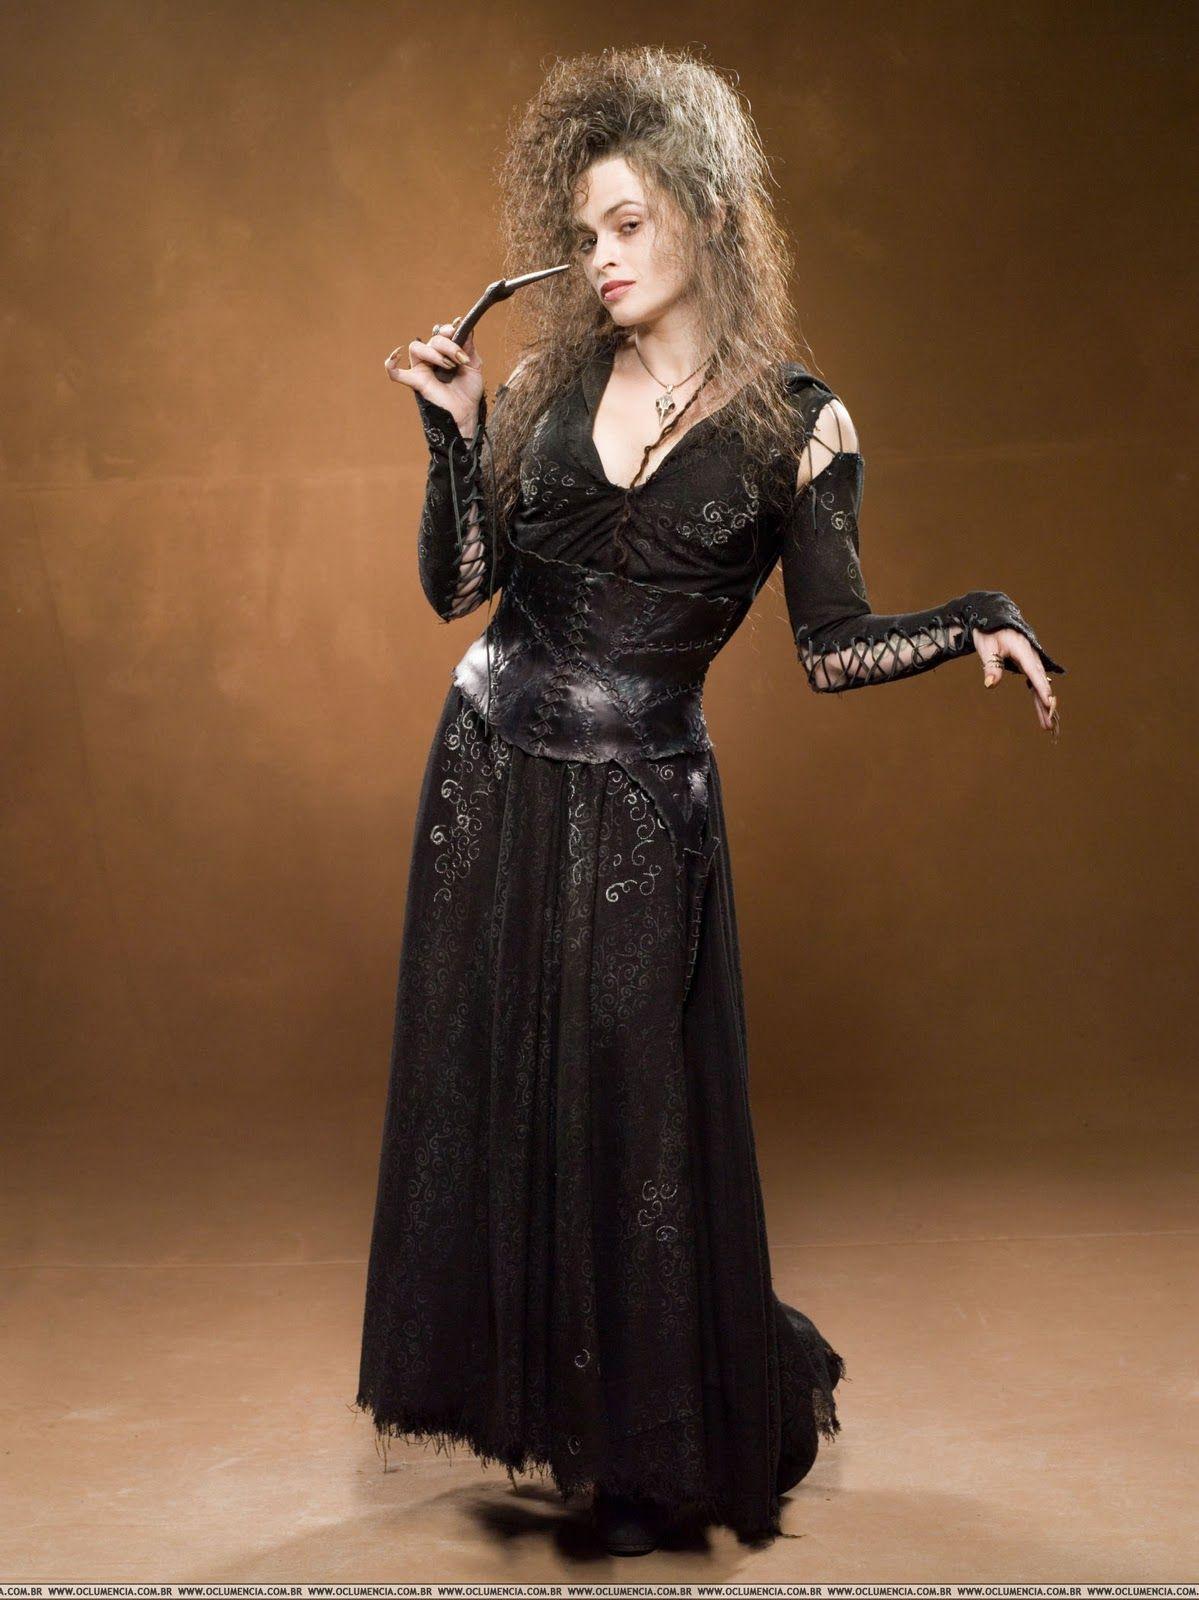 Harry Potter Bellatrix Bella Lestrange Black Dress Cosplay Costume Party Dress